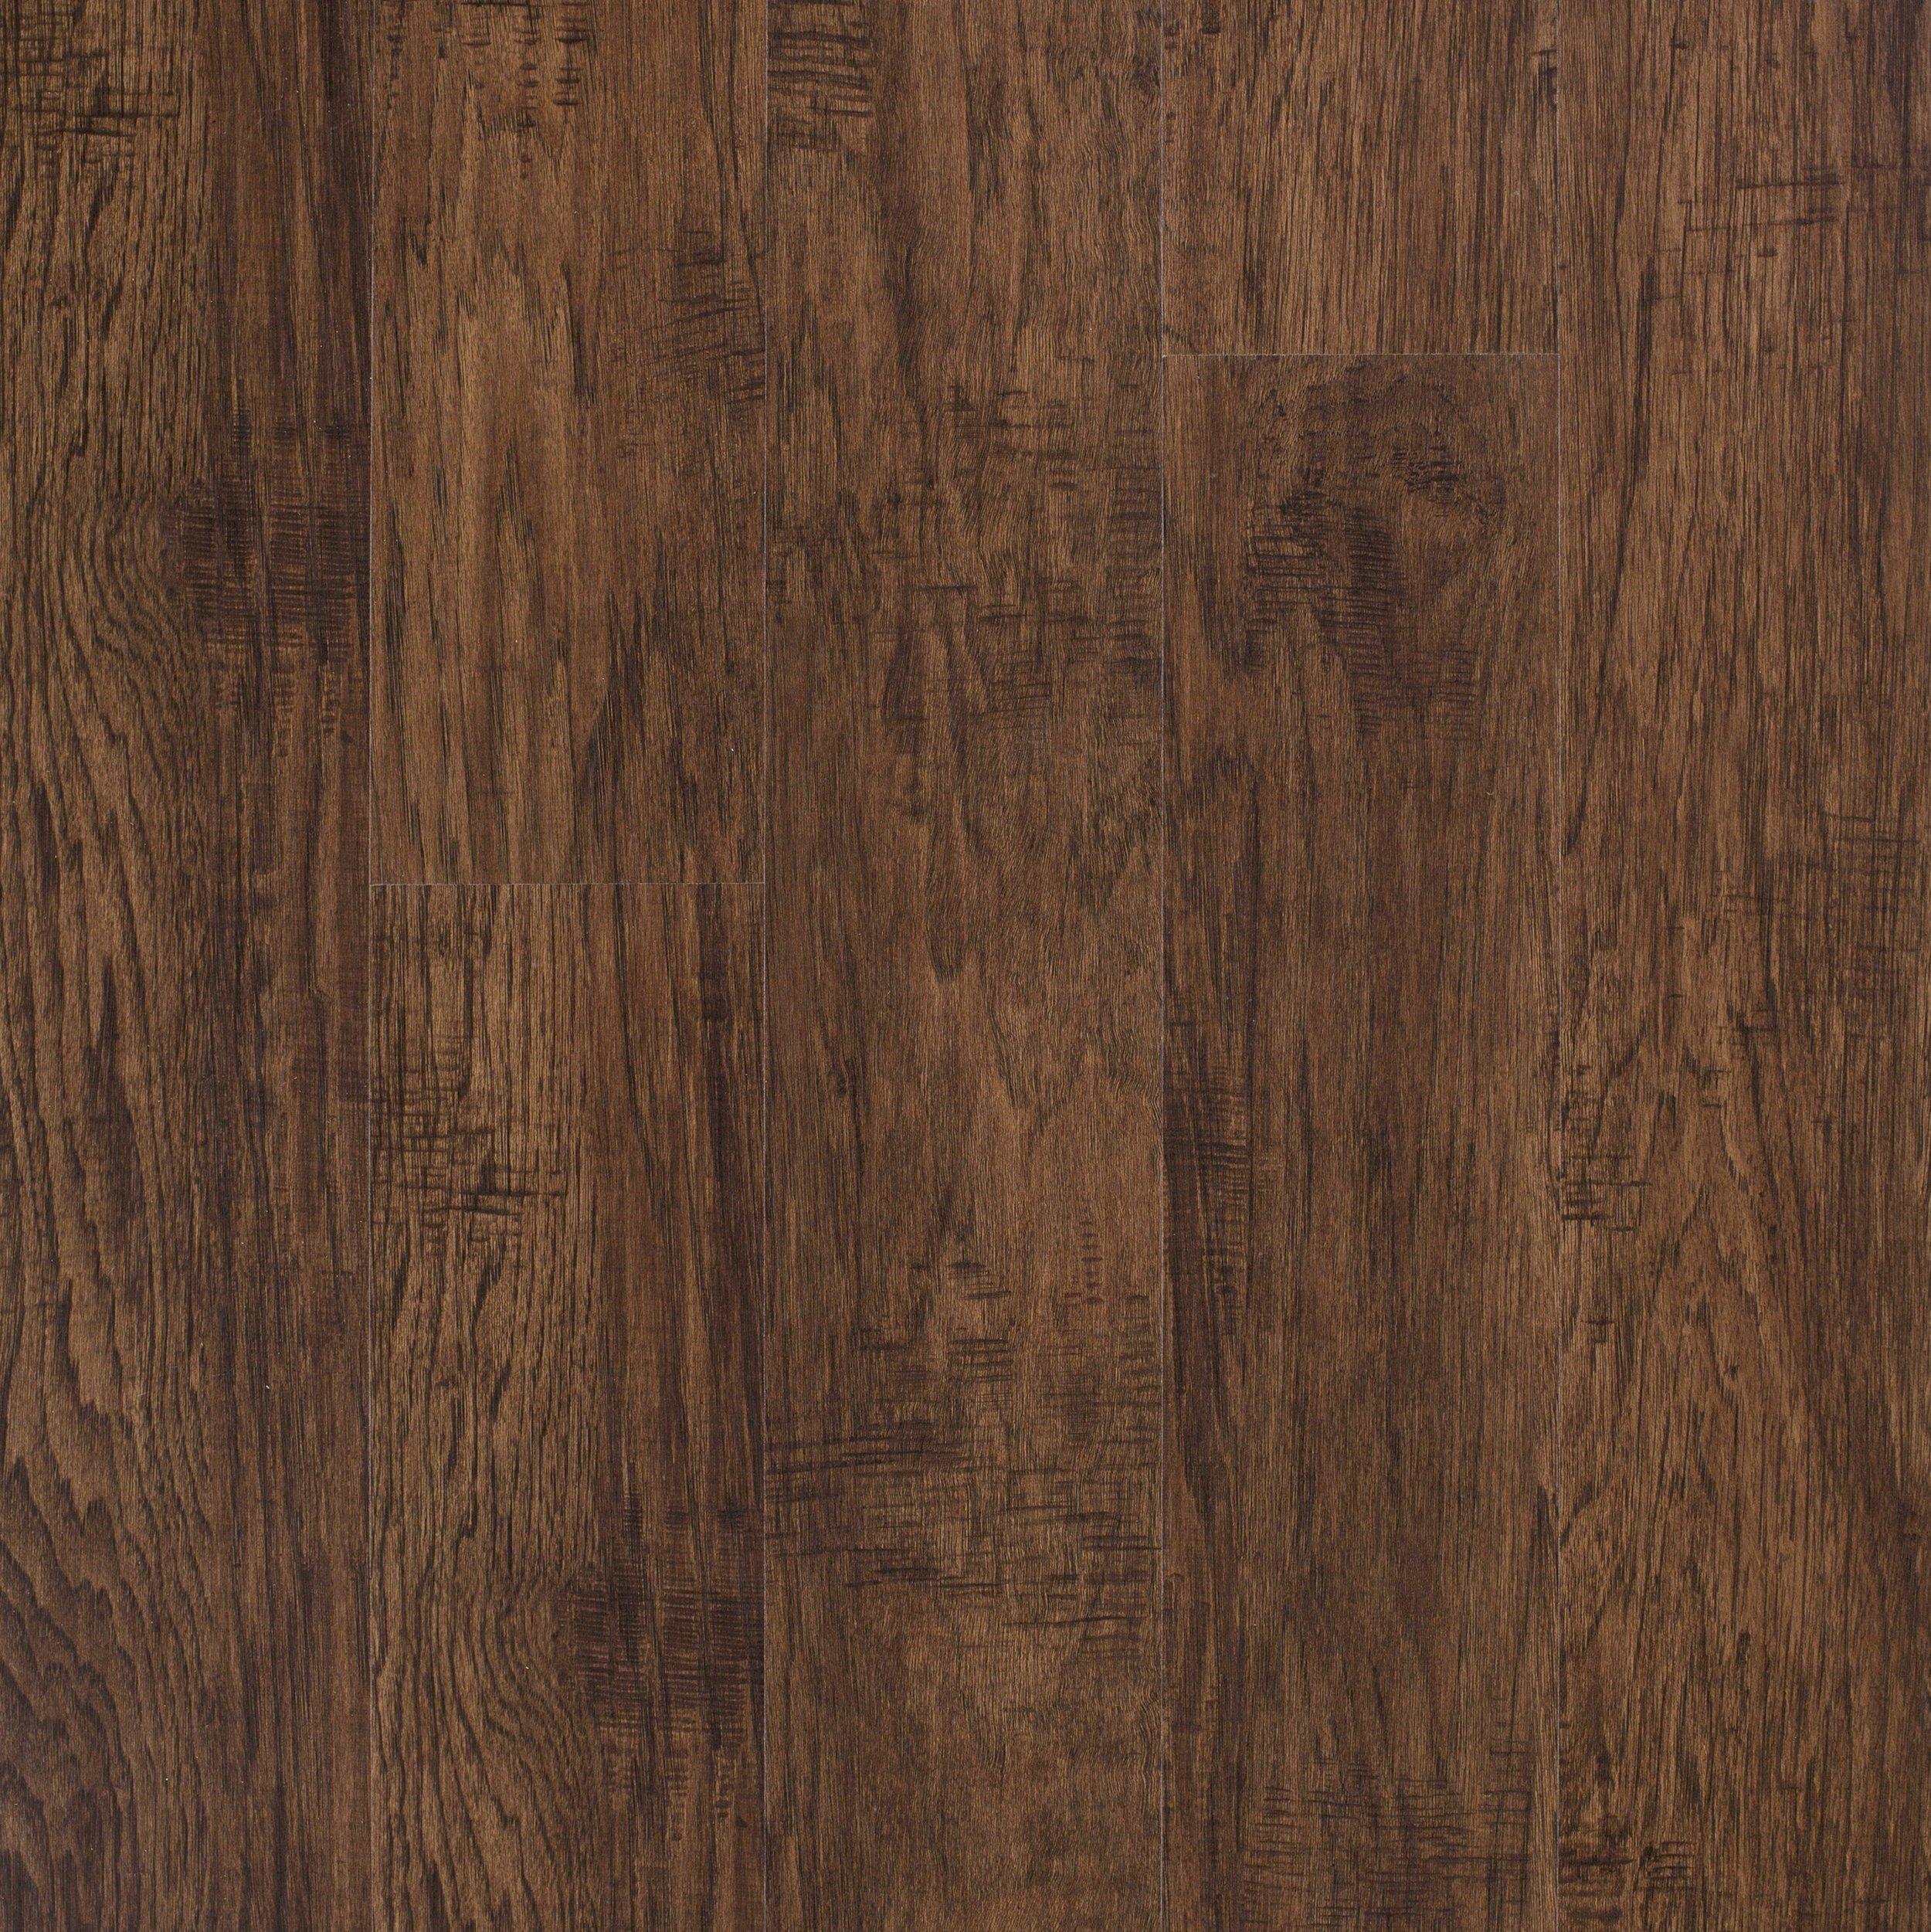 Old Hickory Laminate, Wildwood Laminate Flooring Reviews